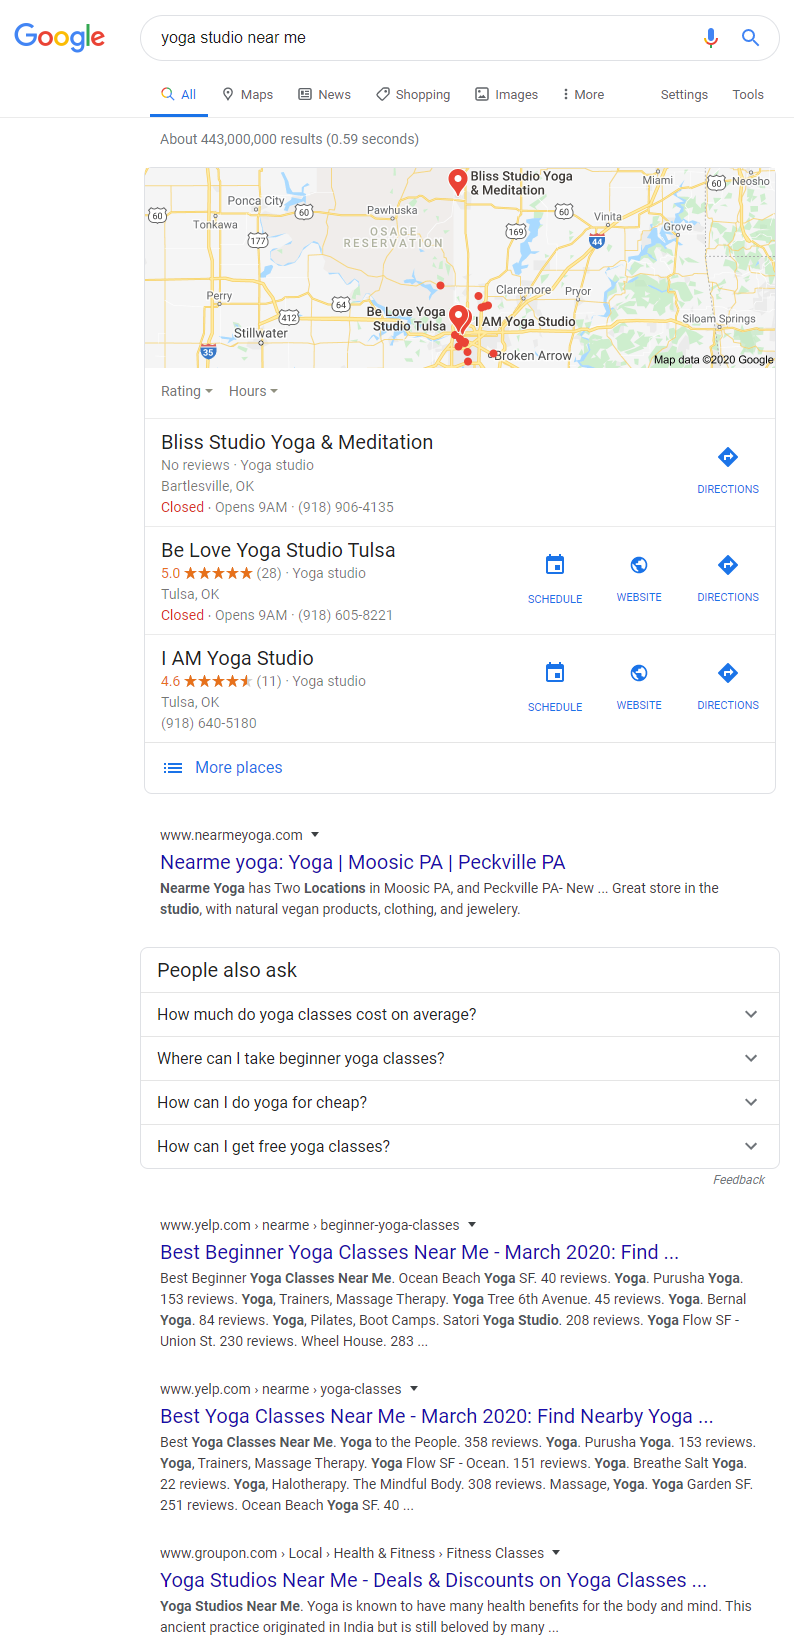 Google Search - Yoga Studio Near Me